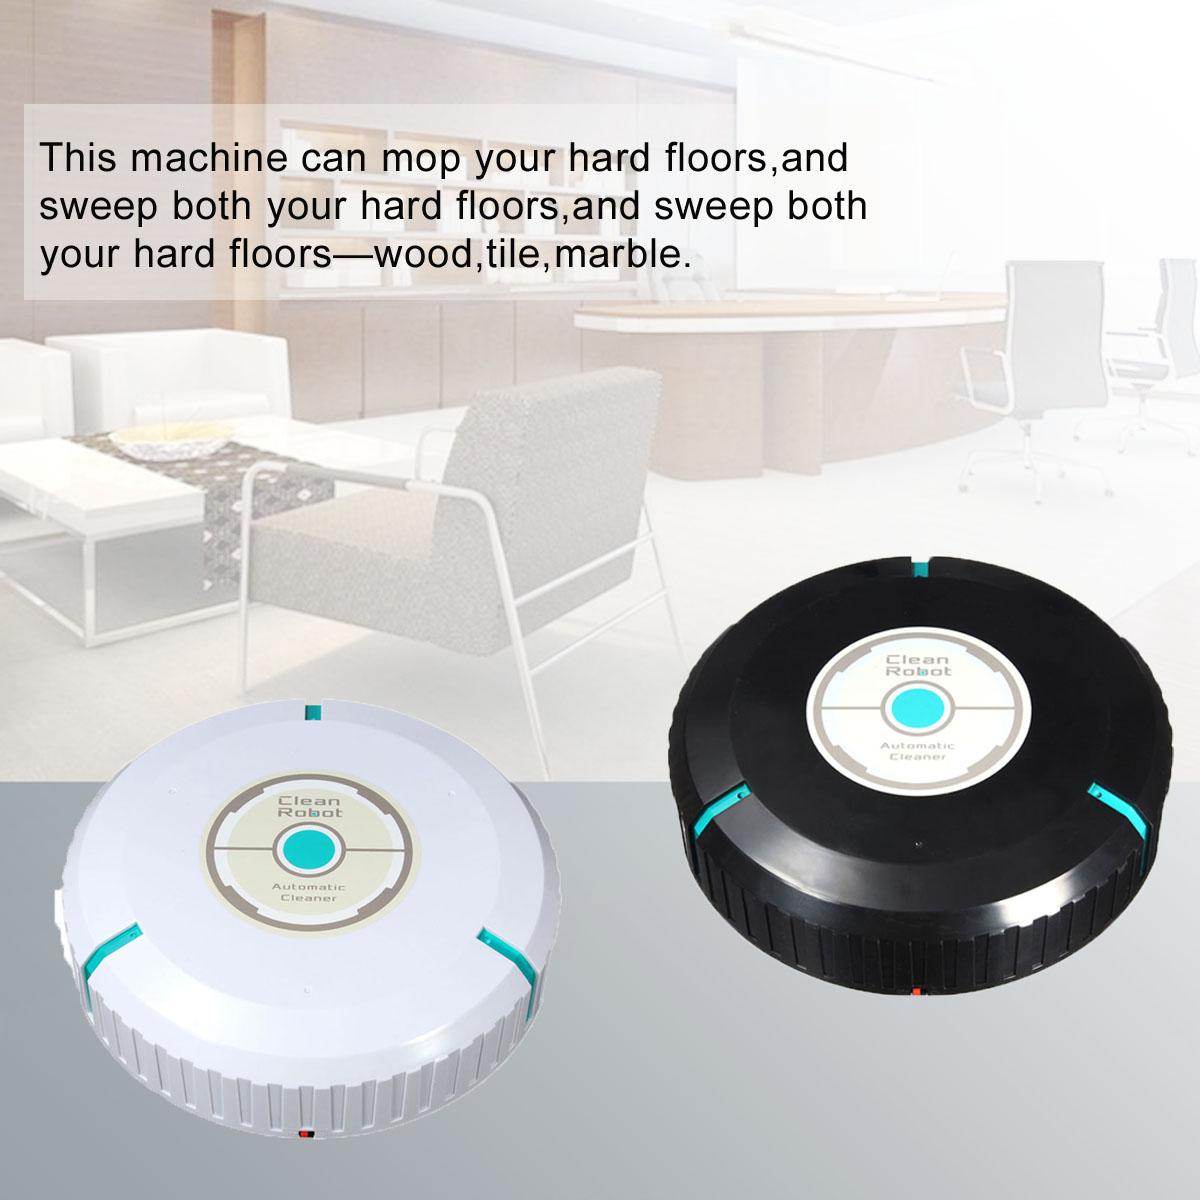 Dust mop for wood floors - Home Auto Cleaner Robot Smart Mop Dust Cleaner Black Intl Lazada